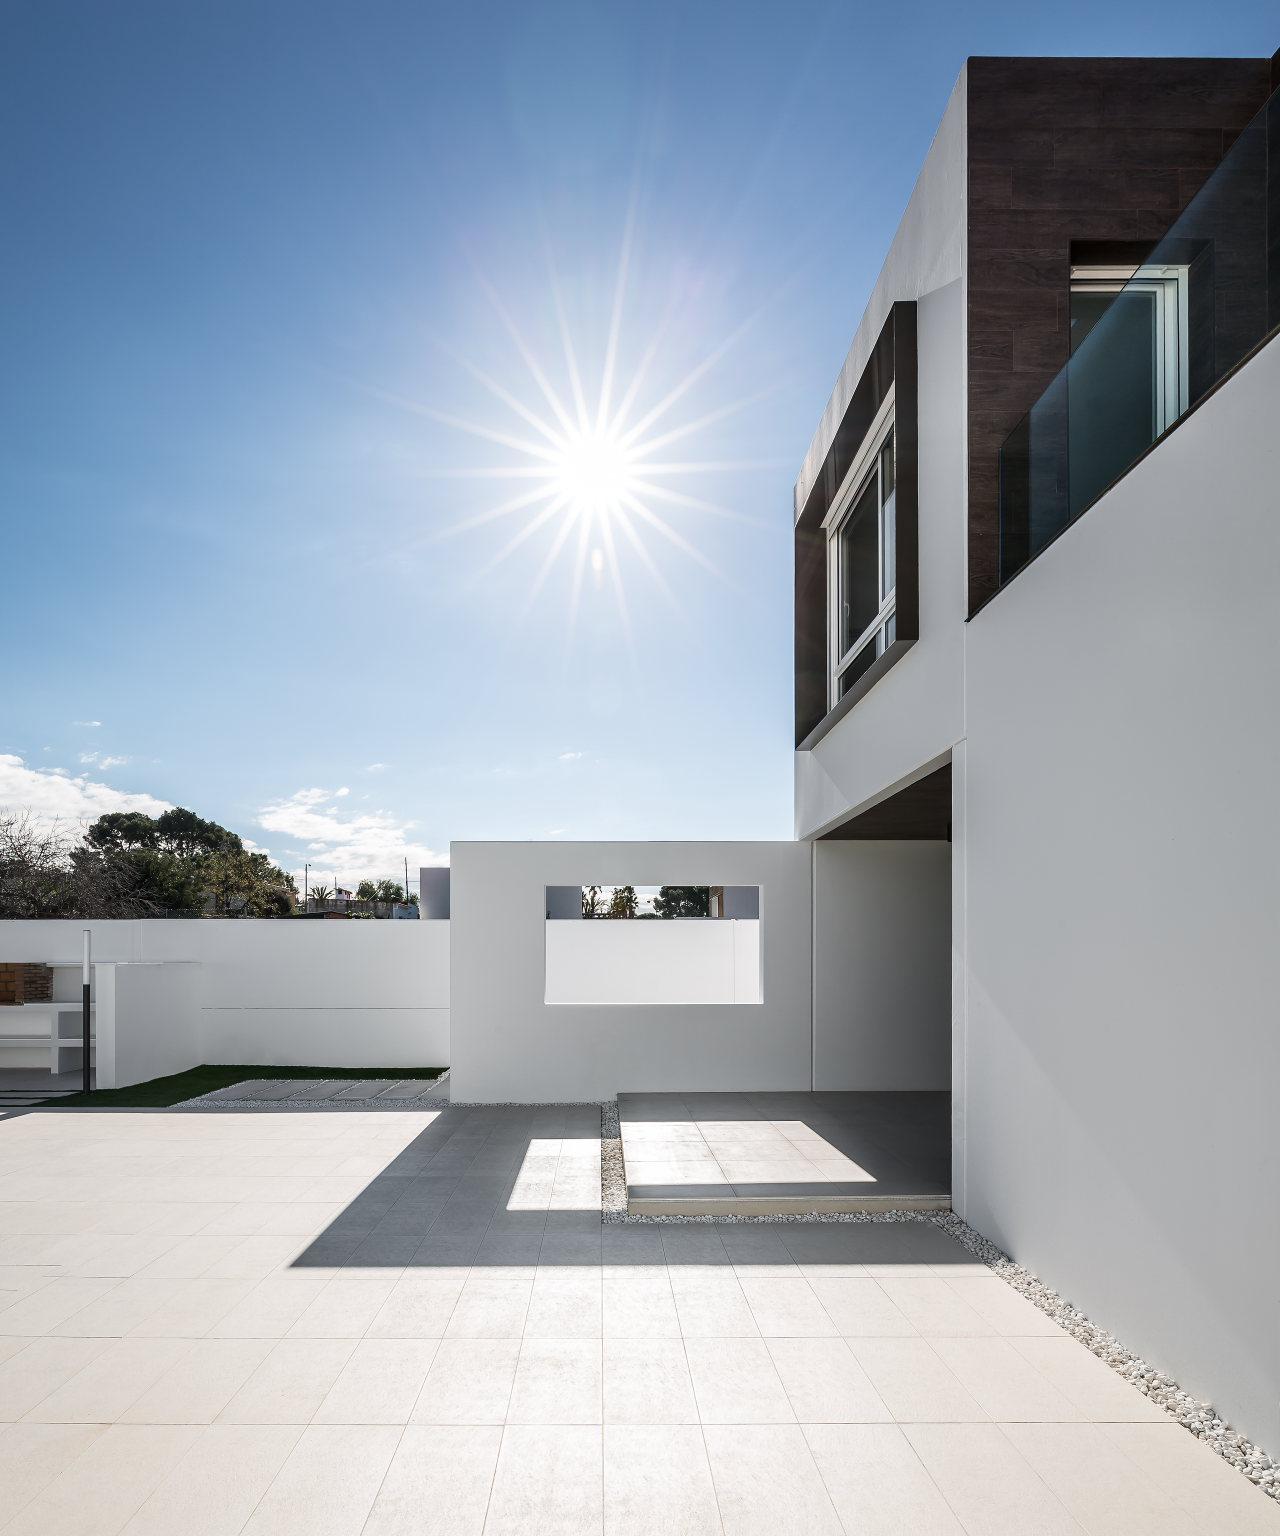 fotografia-arquitectura-valencia-german-cabo-viraje-san-antonio (10)